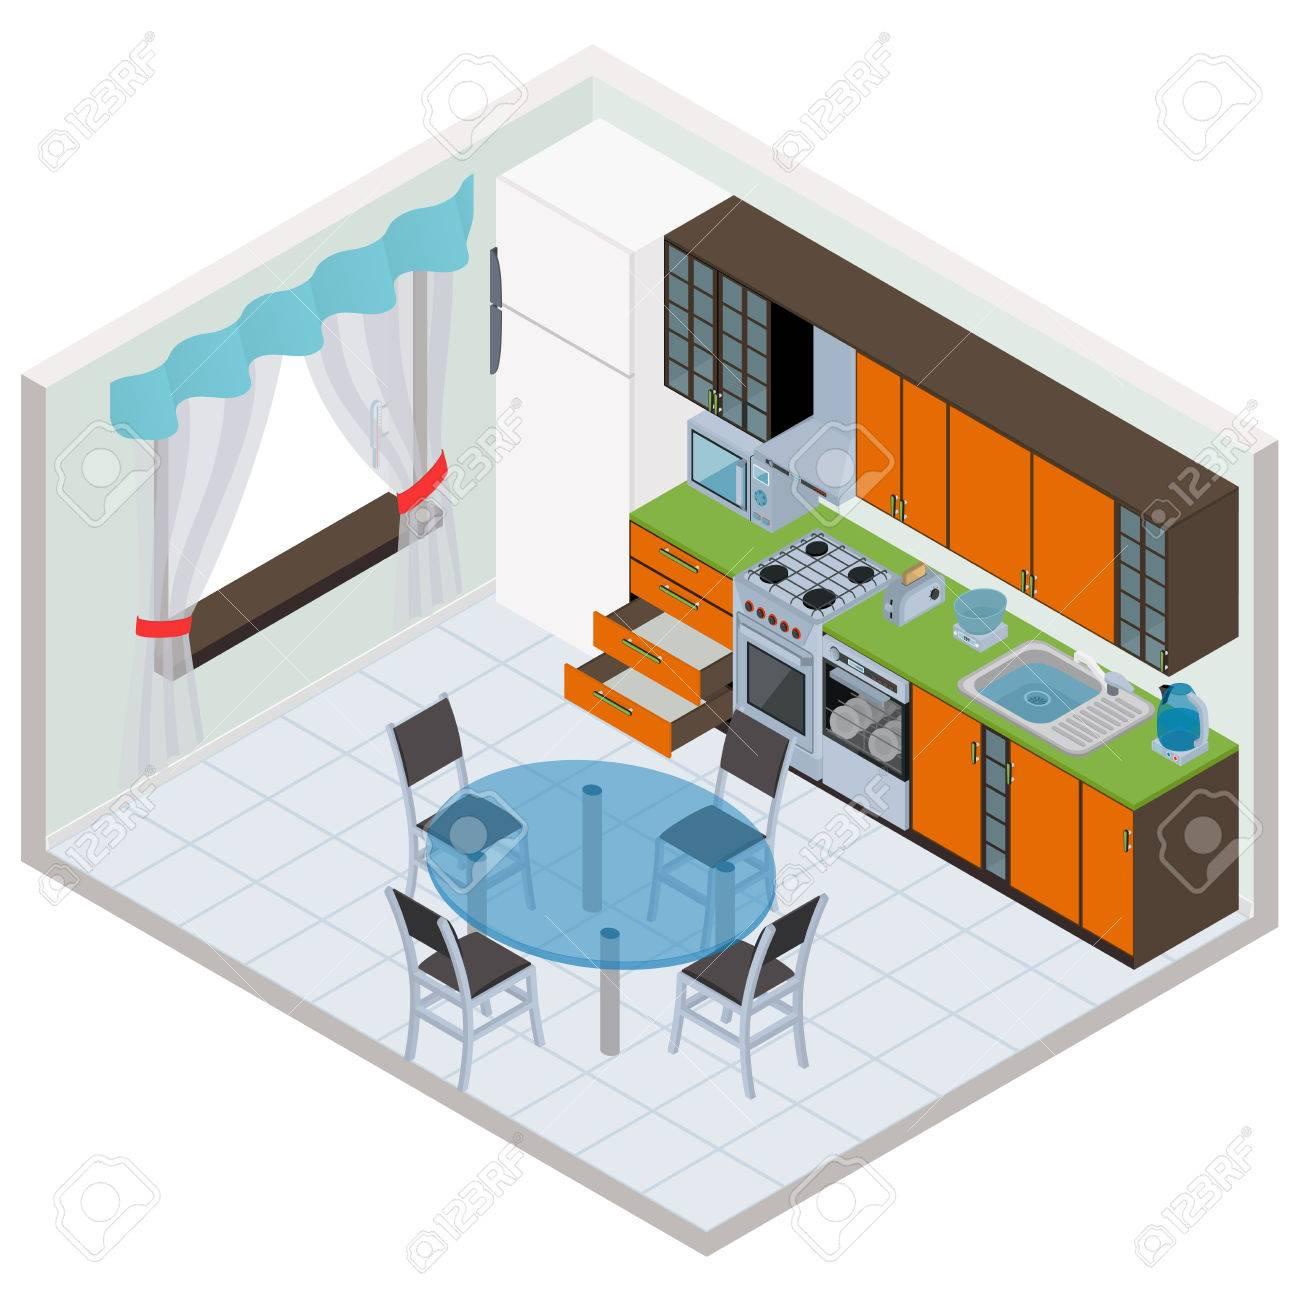 Vector isometric kitchen interior - 3D illustration - 39377936